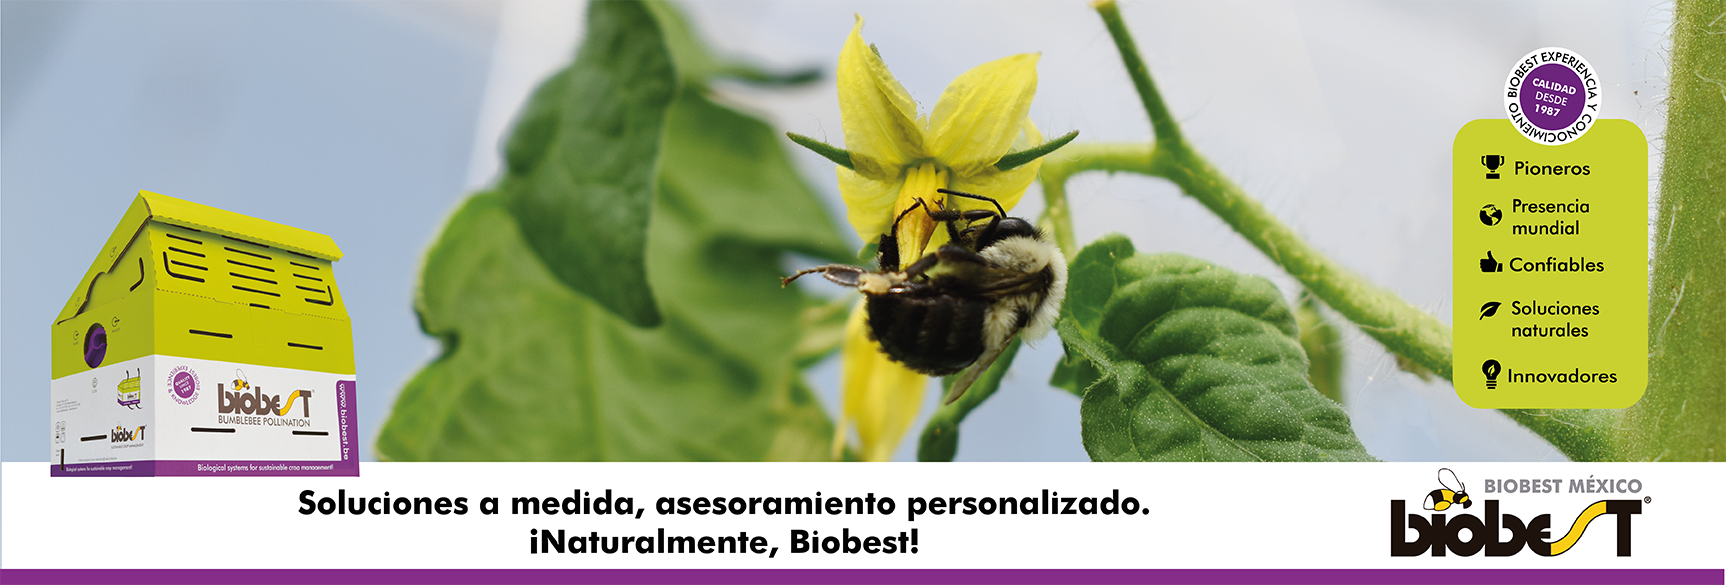 Biobest-PaginaWebInicio-01